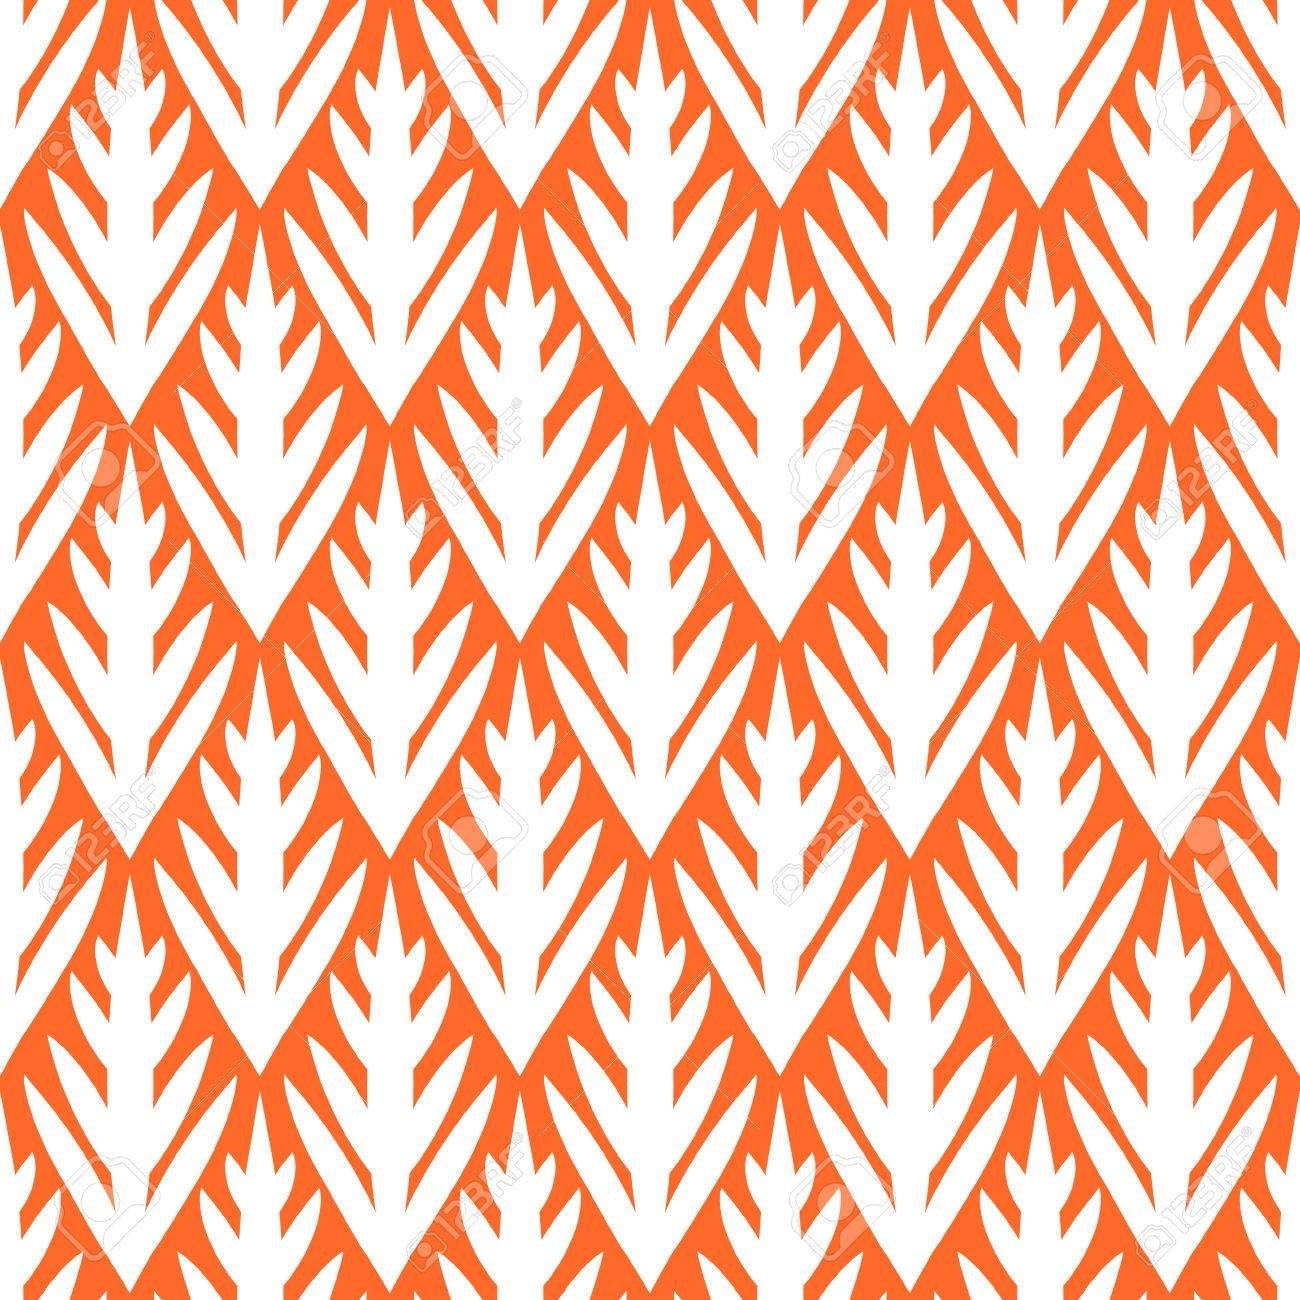 Simple trees geometric ikat seamless pattern in orange, vector - 25435438